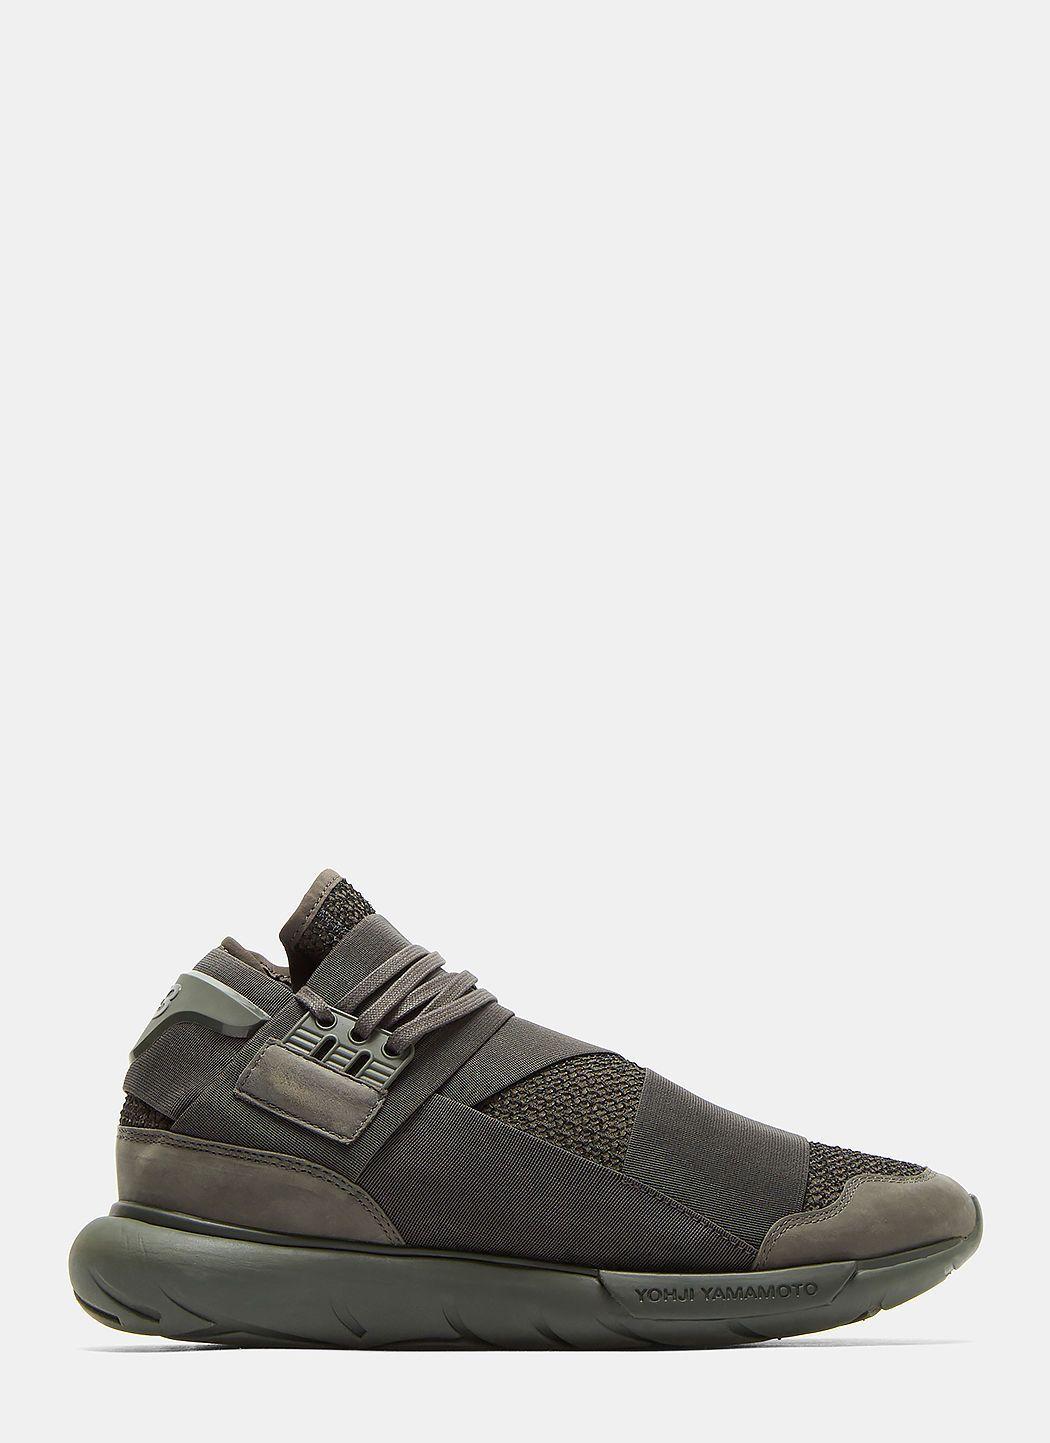 1d4286f5b637 Y-3 Qasa High Mesh Sneakers In Dark Khaki.  y-3  shoes